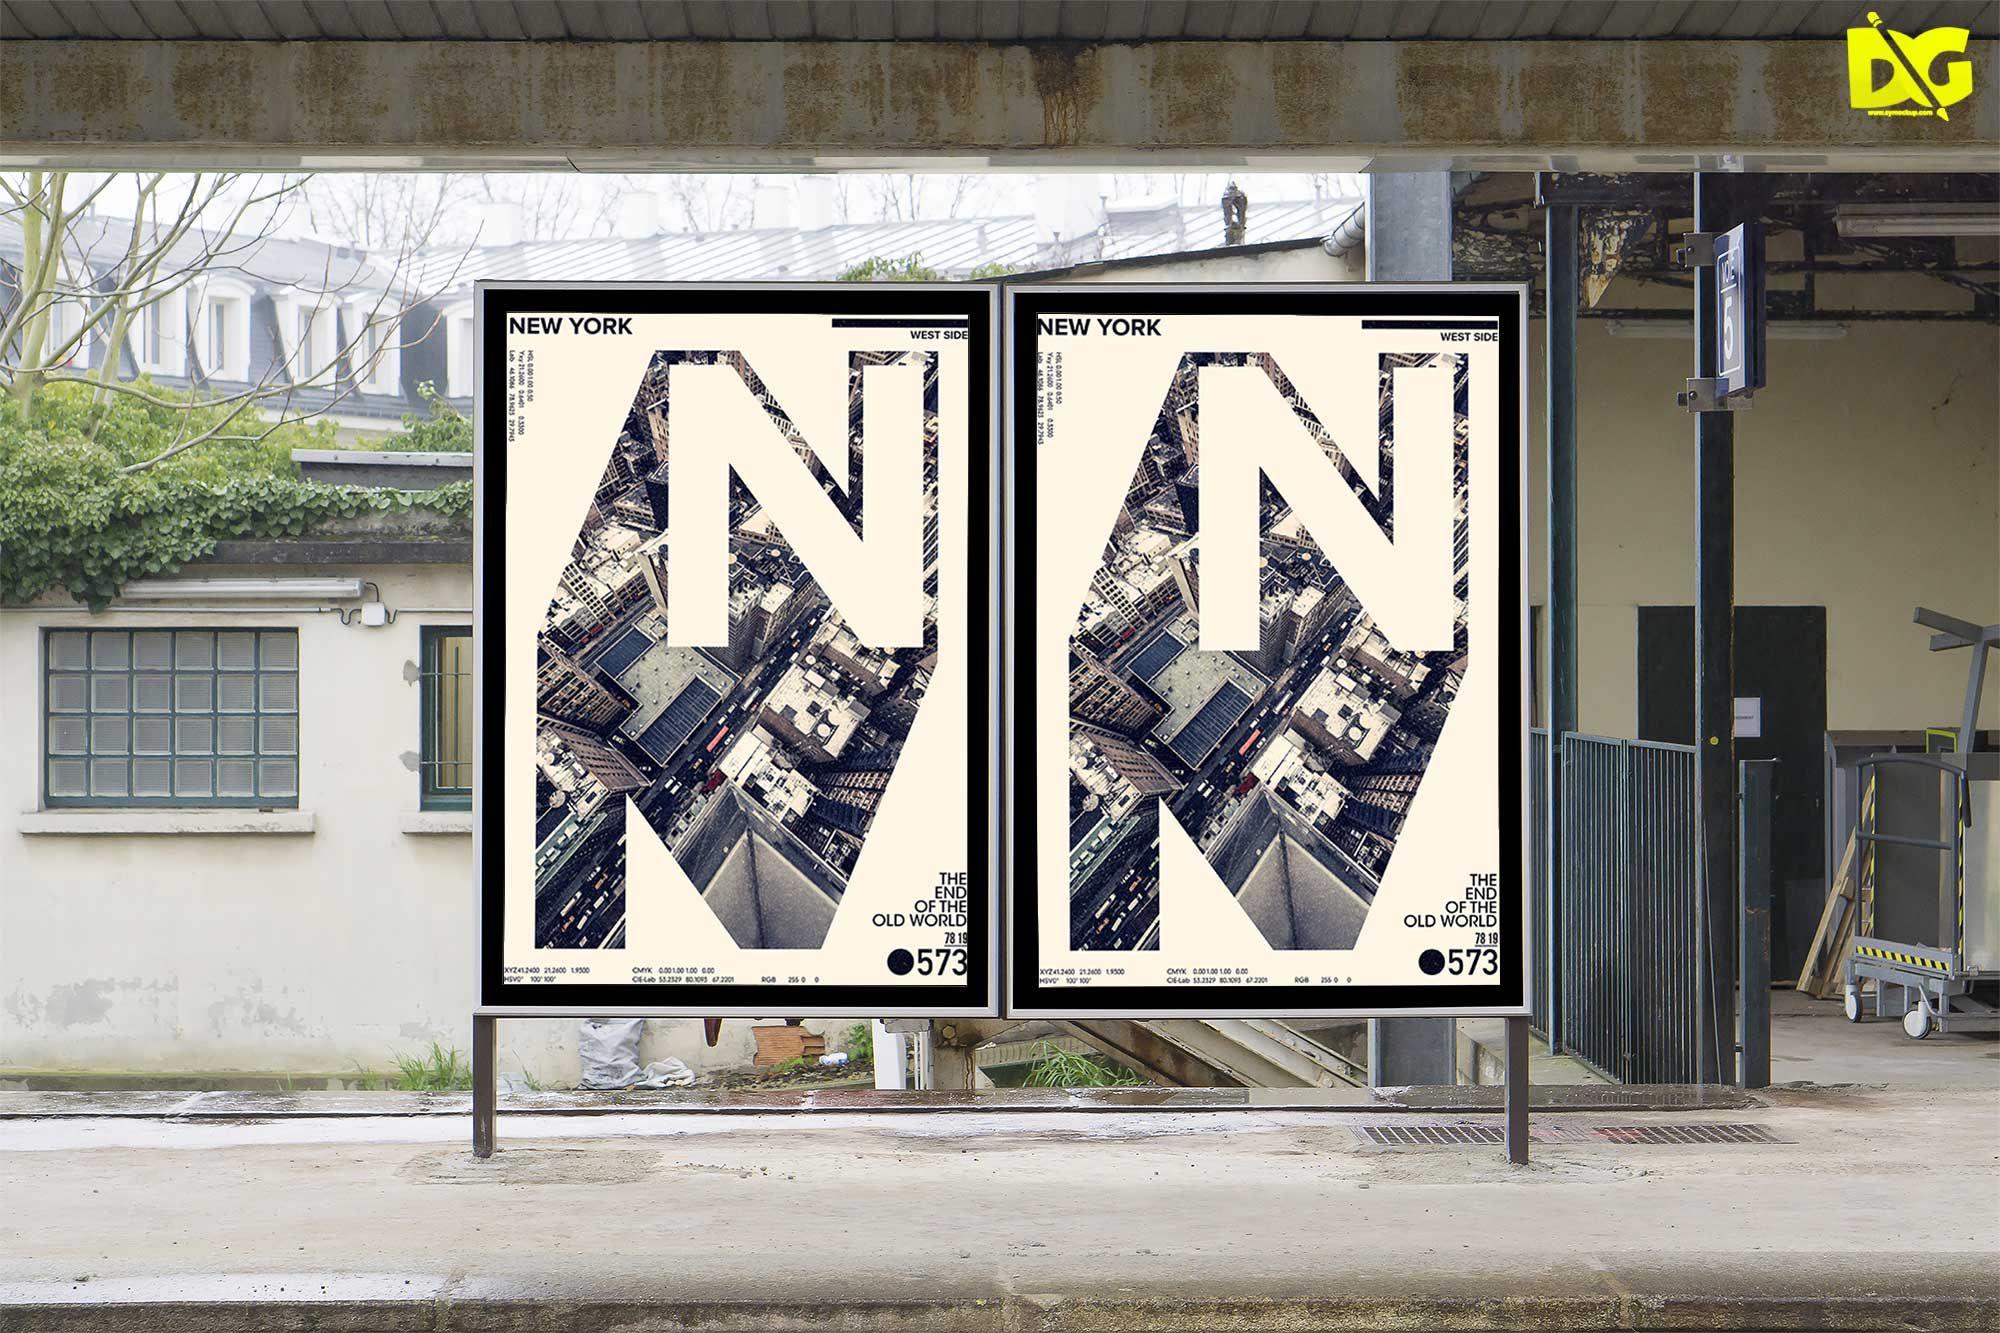 Free Street Poster Mockup Postermockup Streetmockup Streetposter Streetpostermockup Labelmockups Poster Mockup Free Poster Mockup Poster Mockup Psd